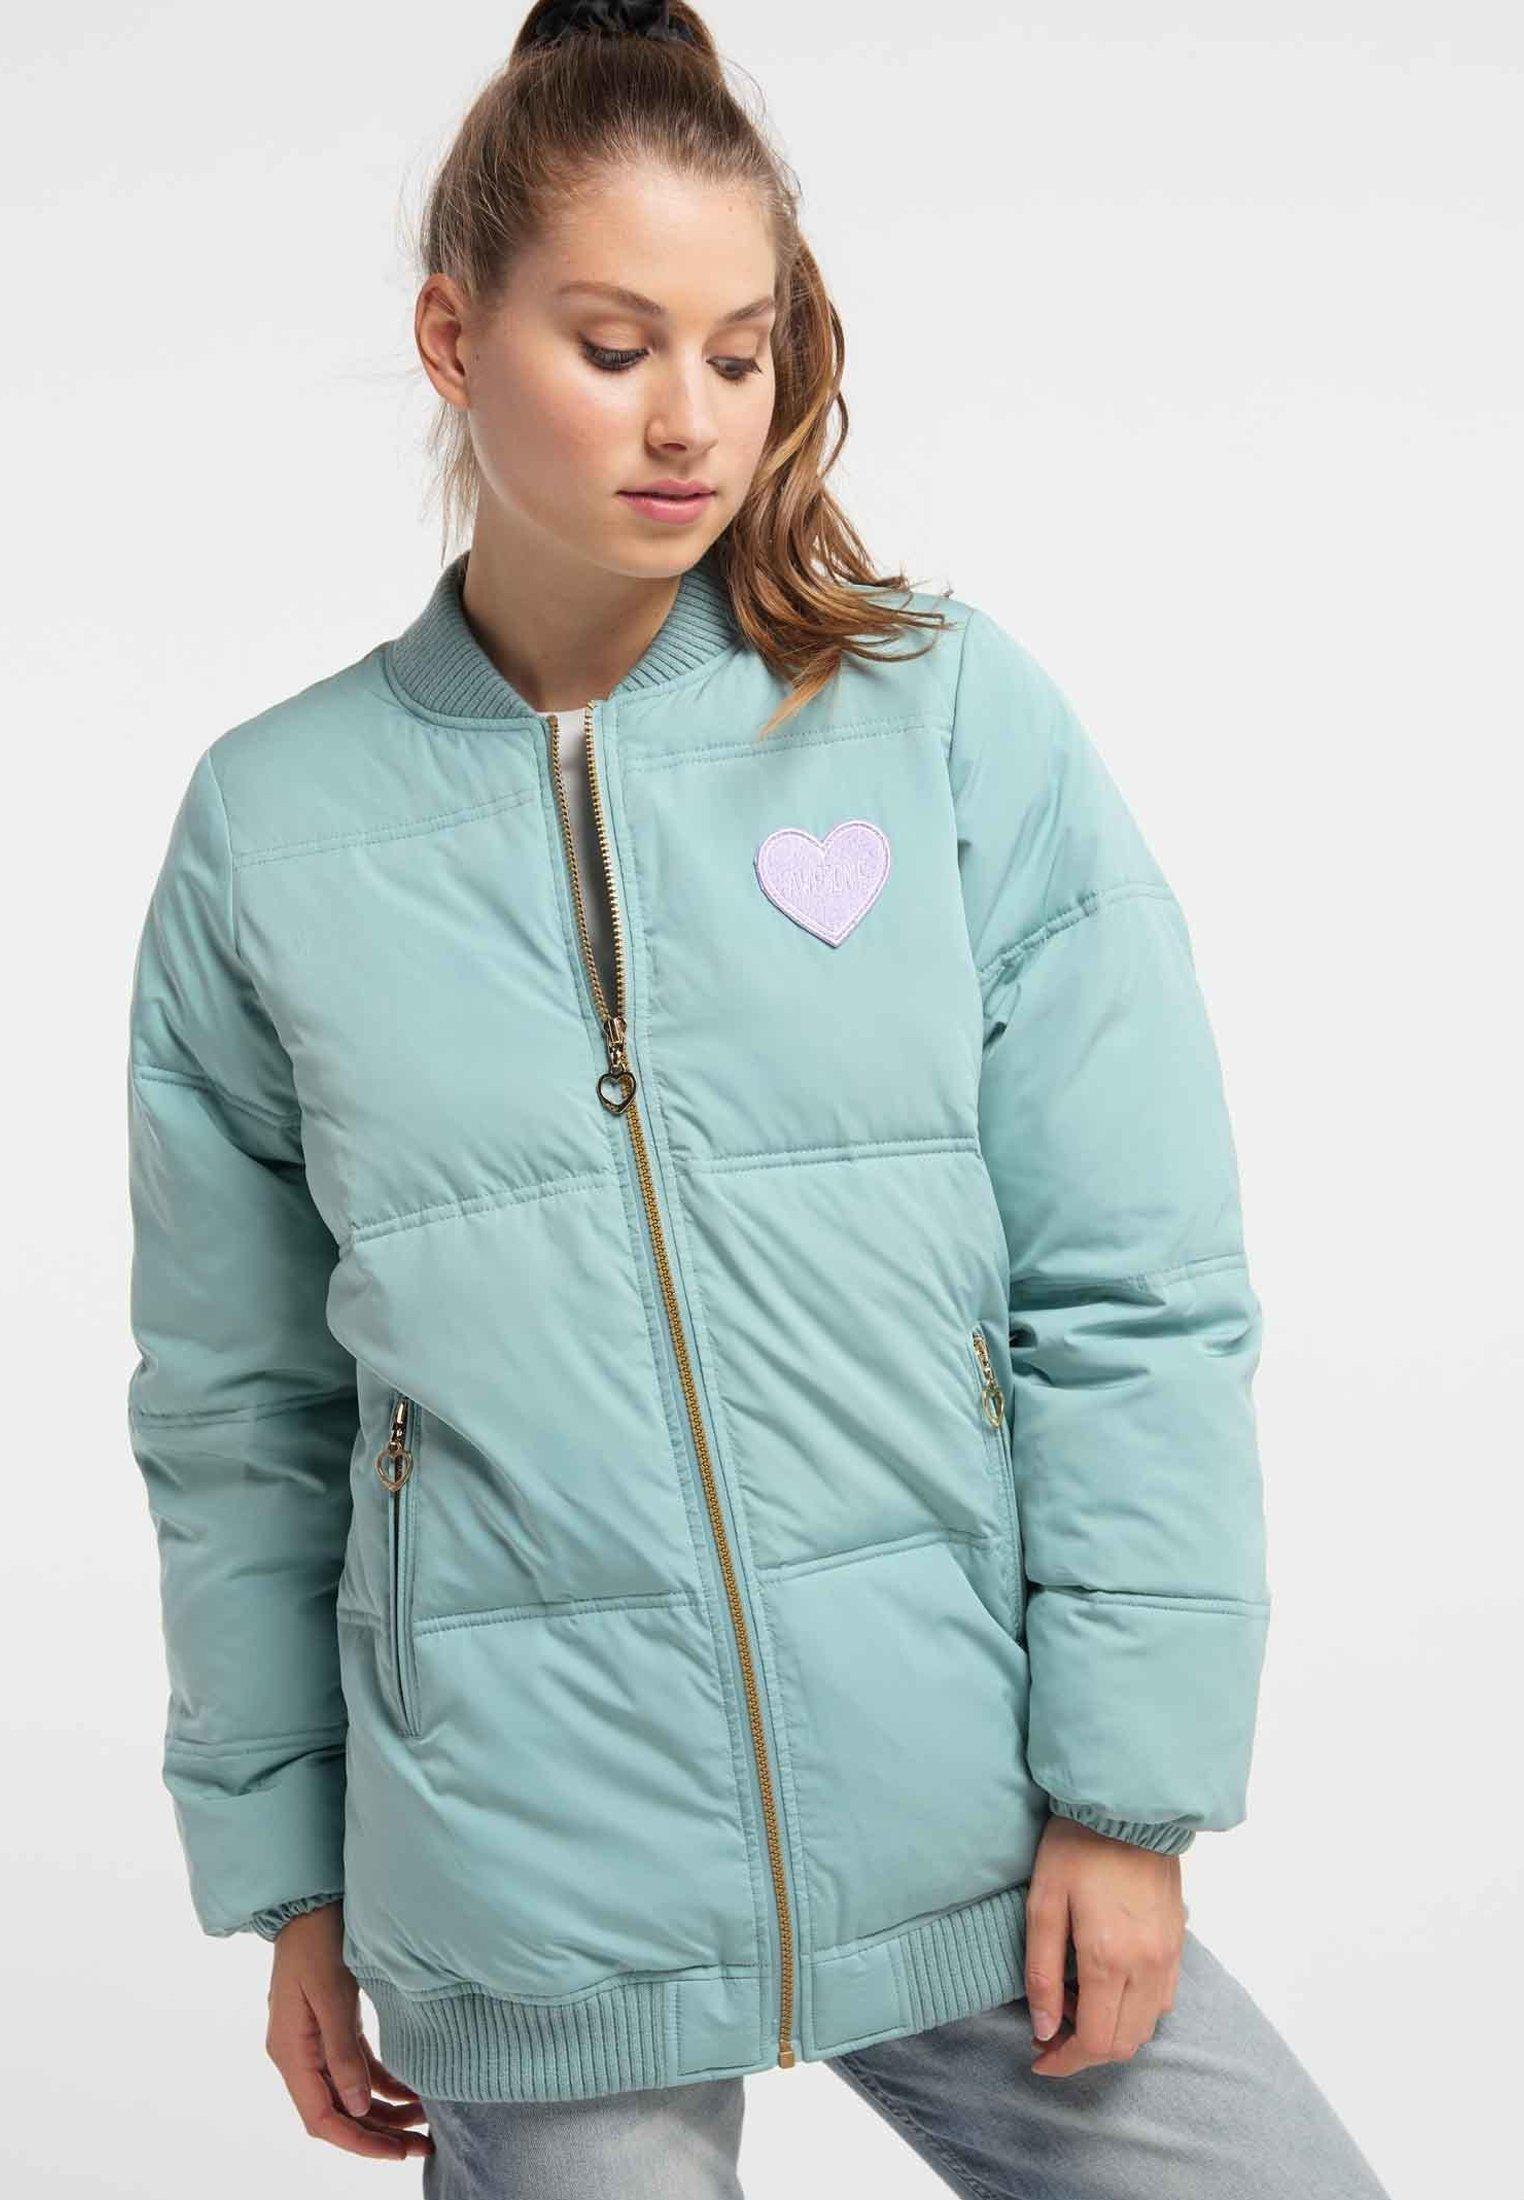 Top-Rated Women's Clothing myMo Winter jacket dark mint fZugLx3aY